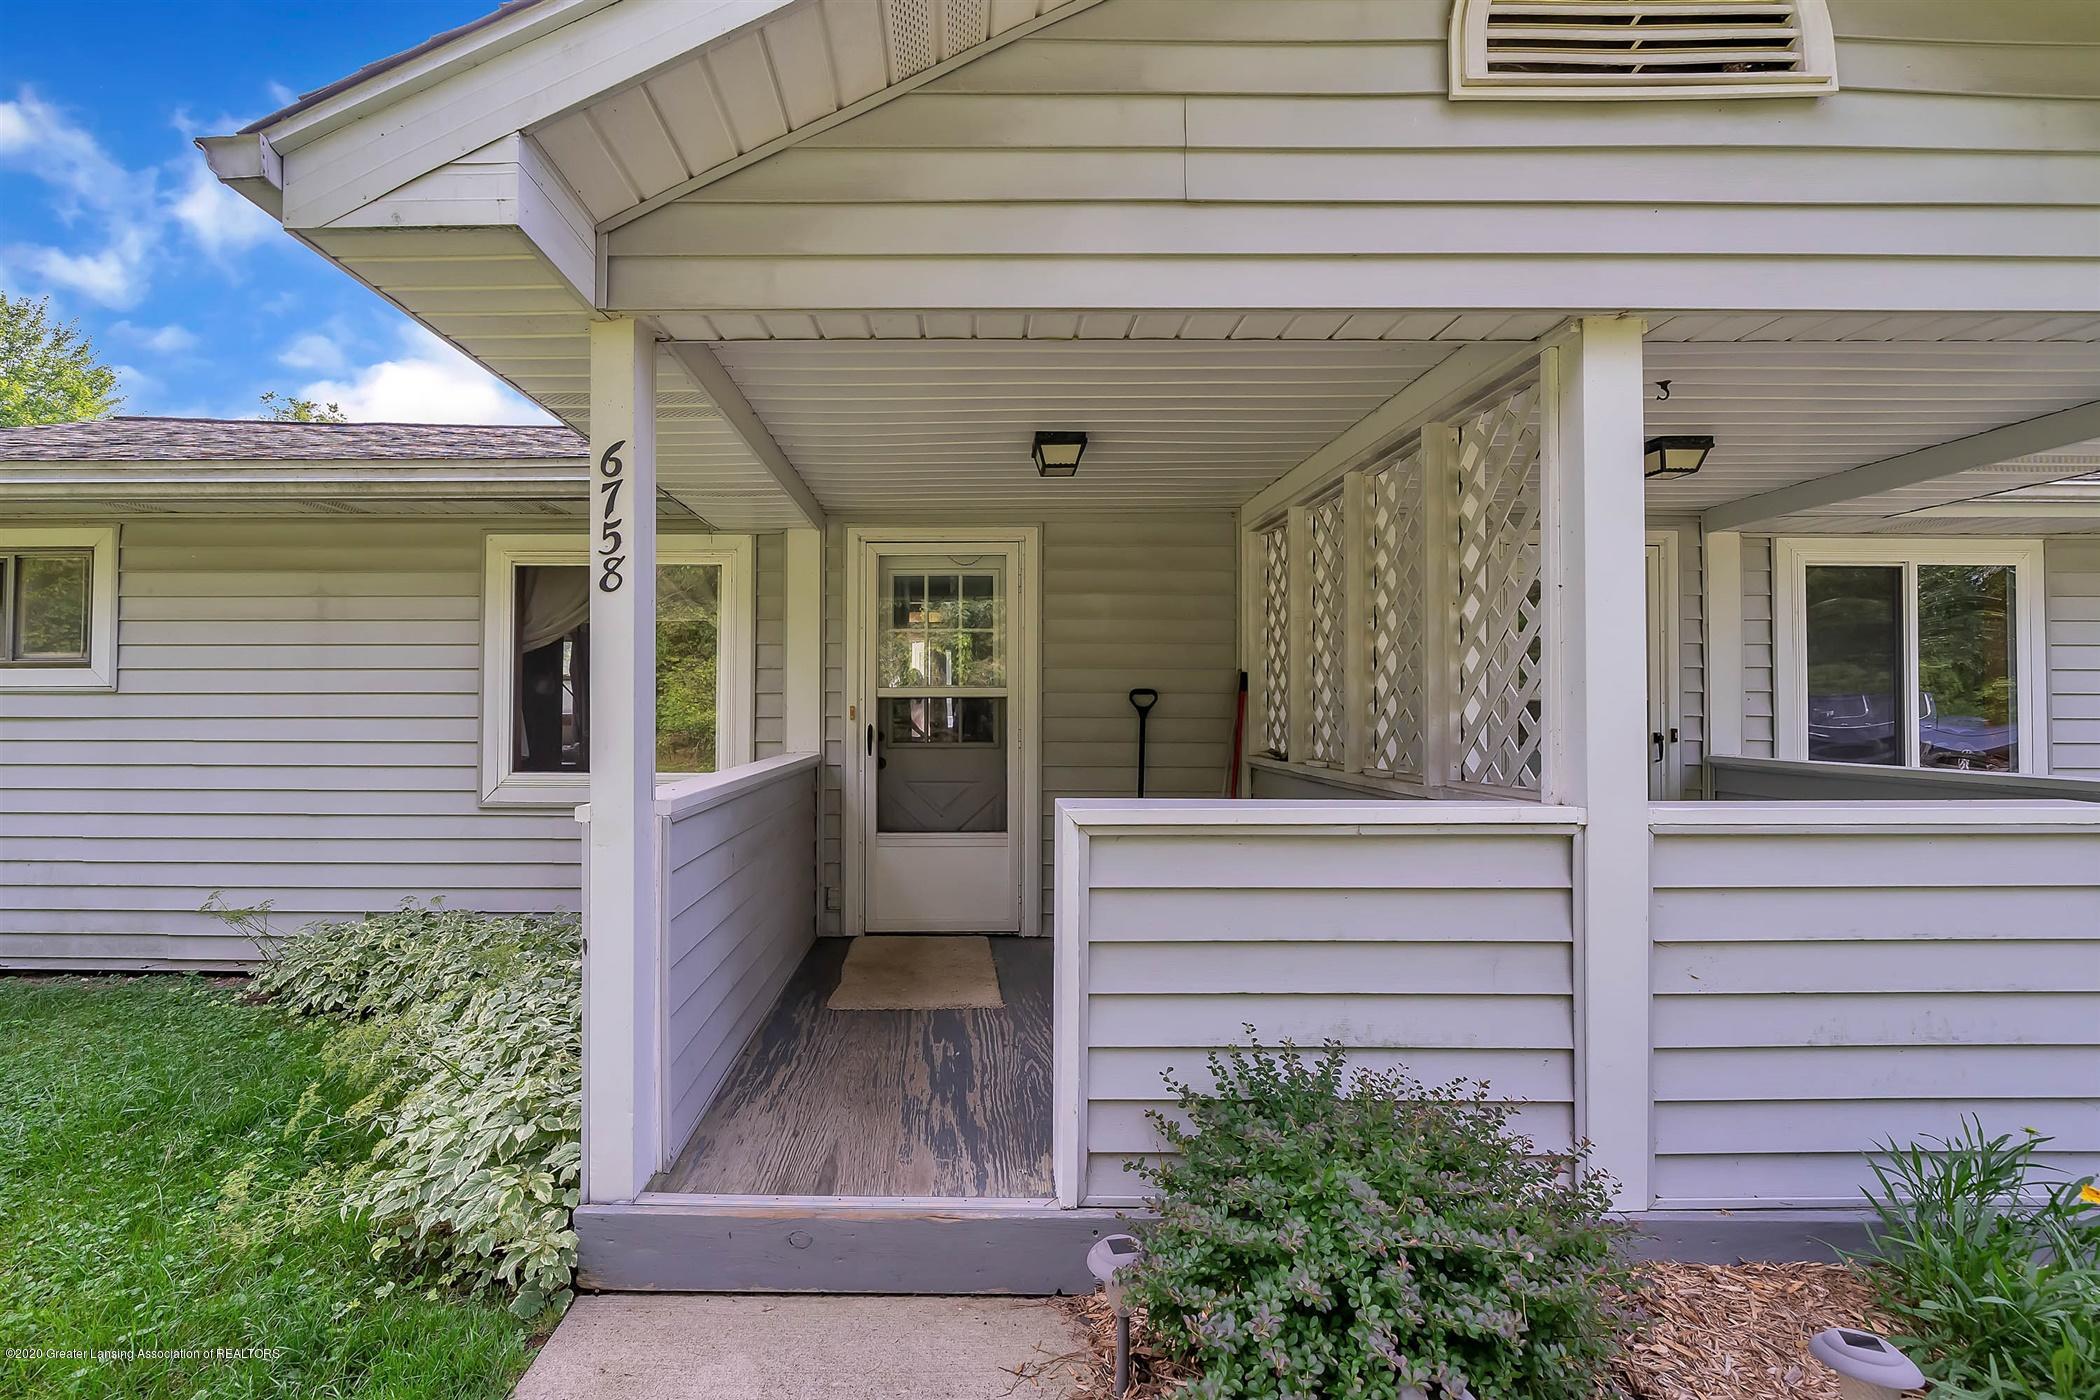 6750 W Lovejoy Rd - (32) 6758 Lovejoy Front Porch - 32